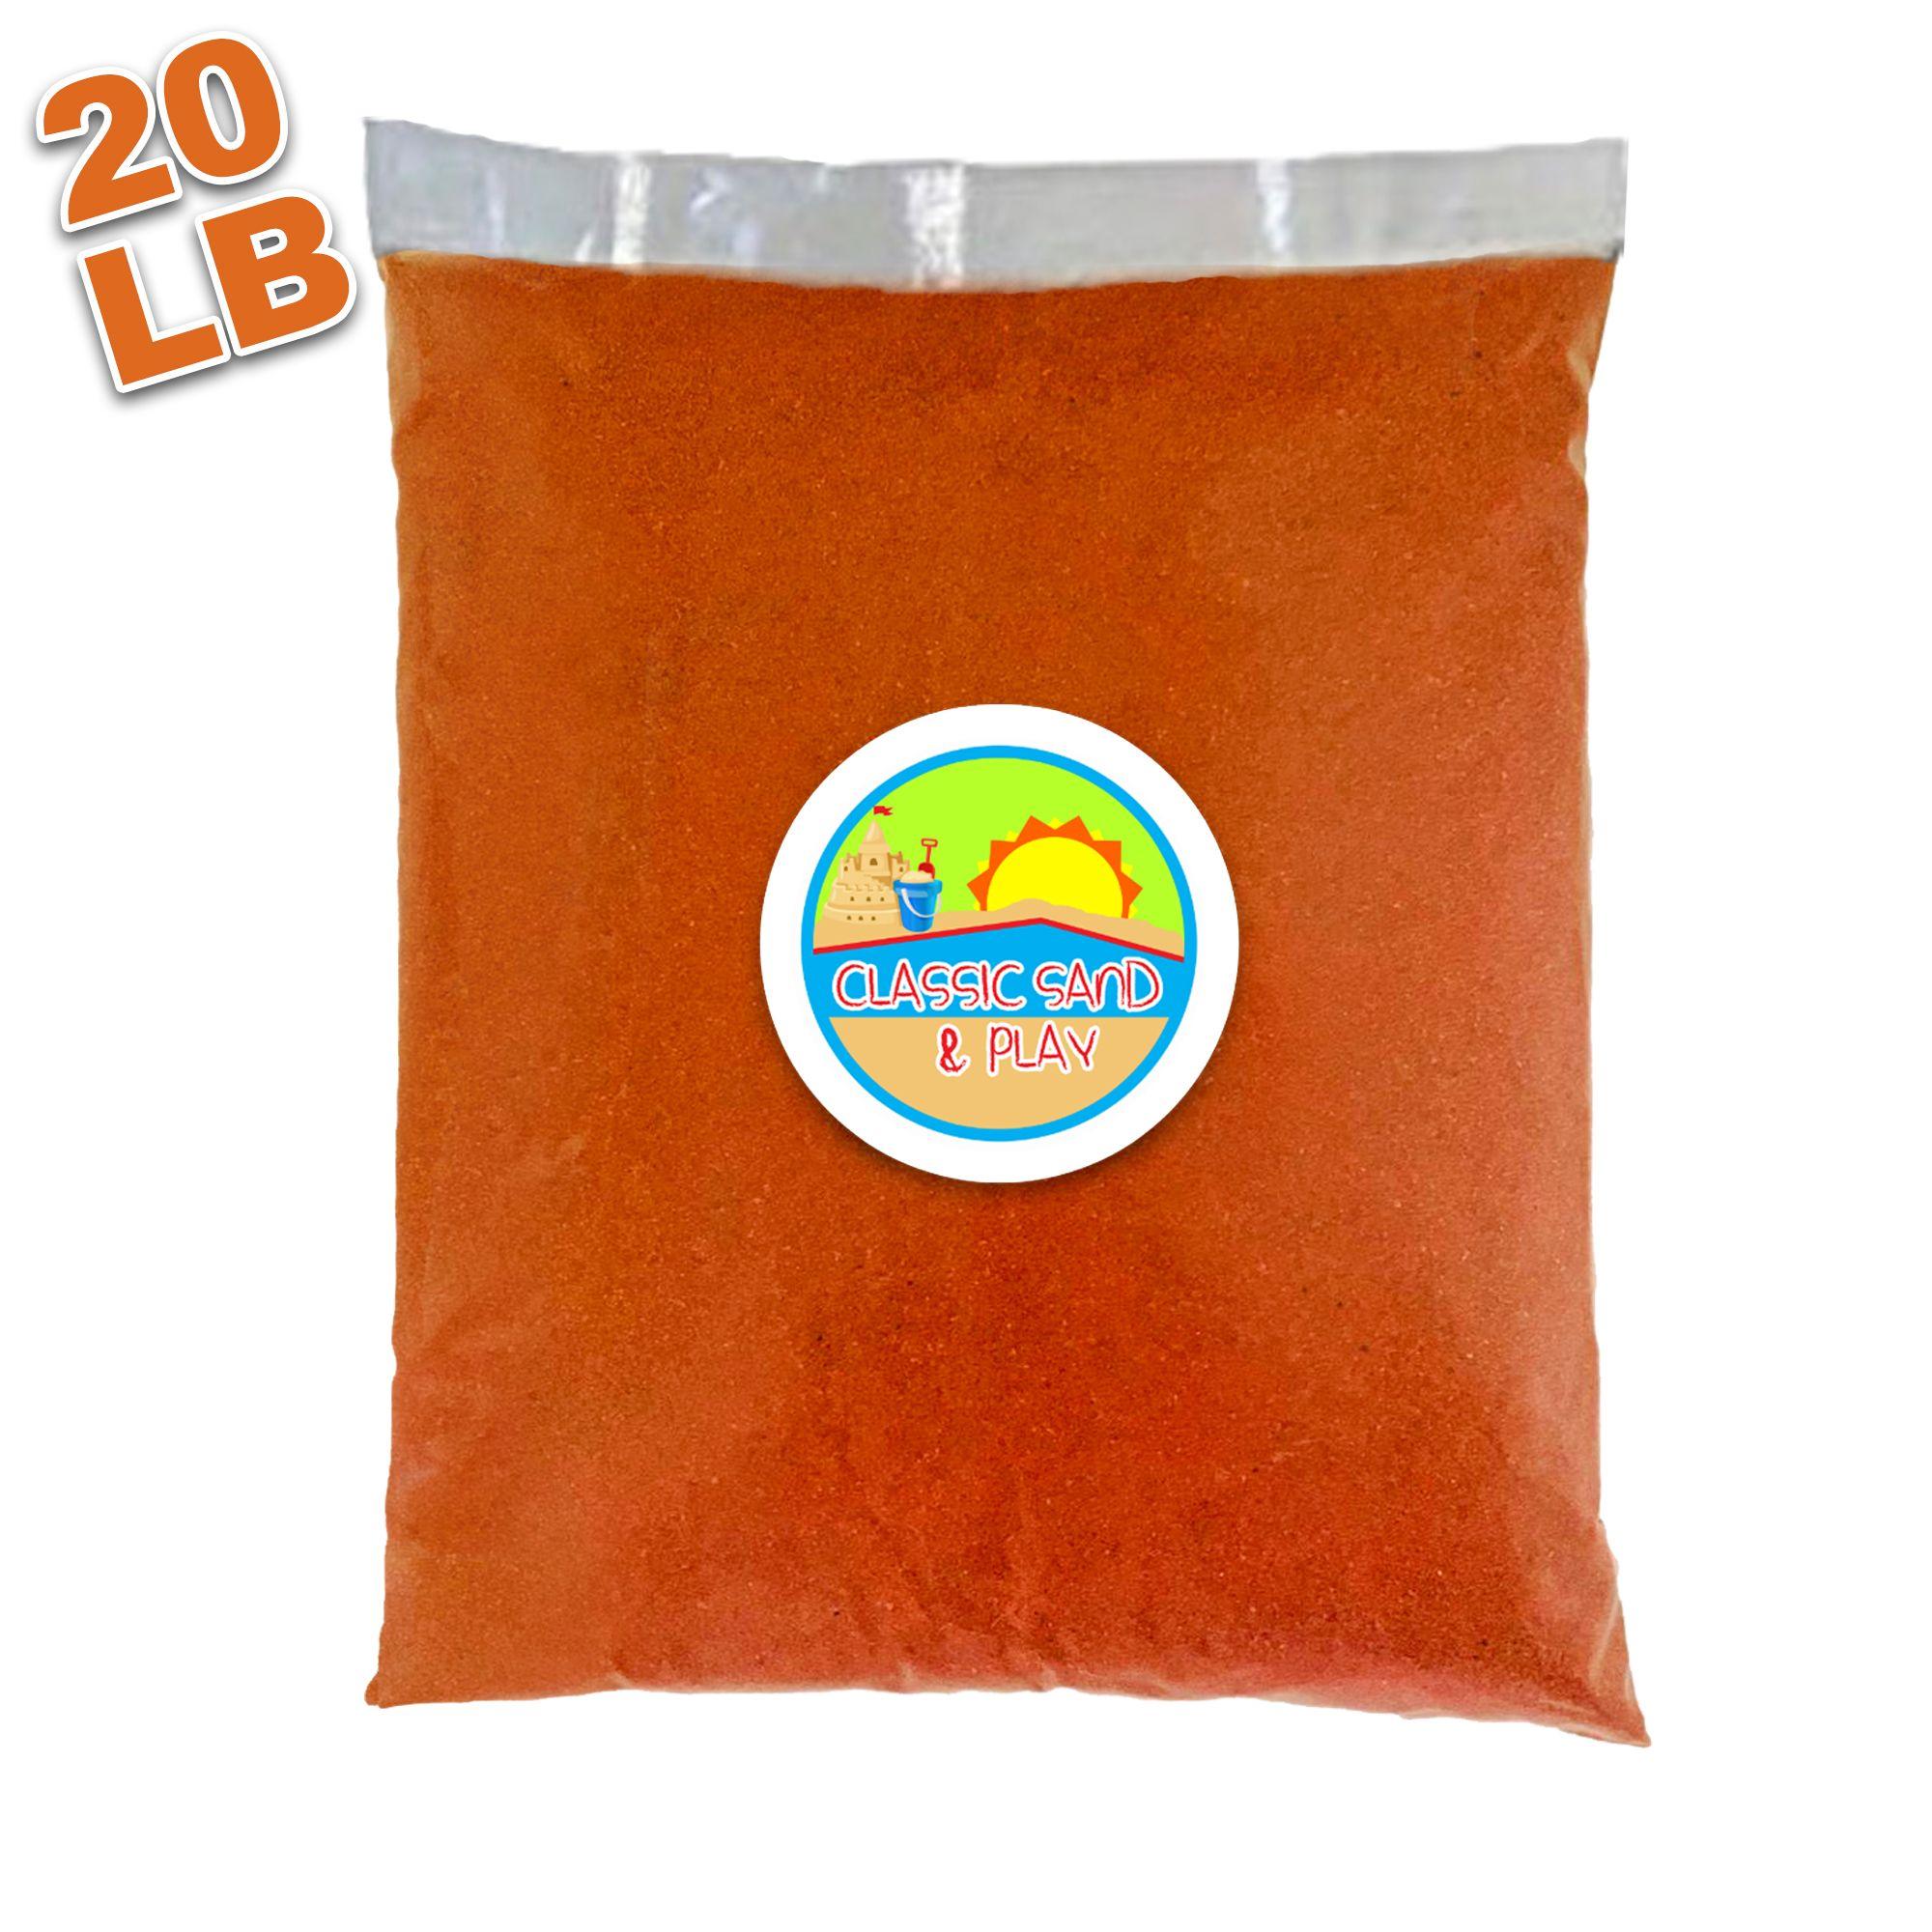 Orange Colored Sand 20 LB - Classic Sand & Play